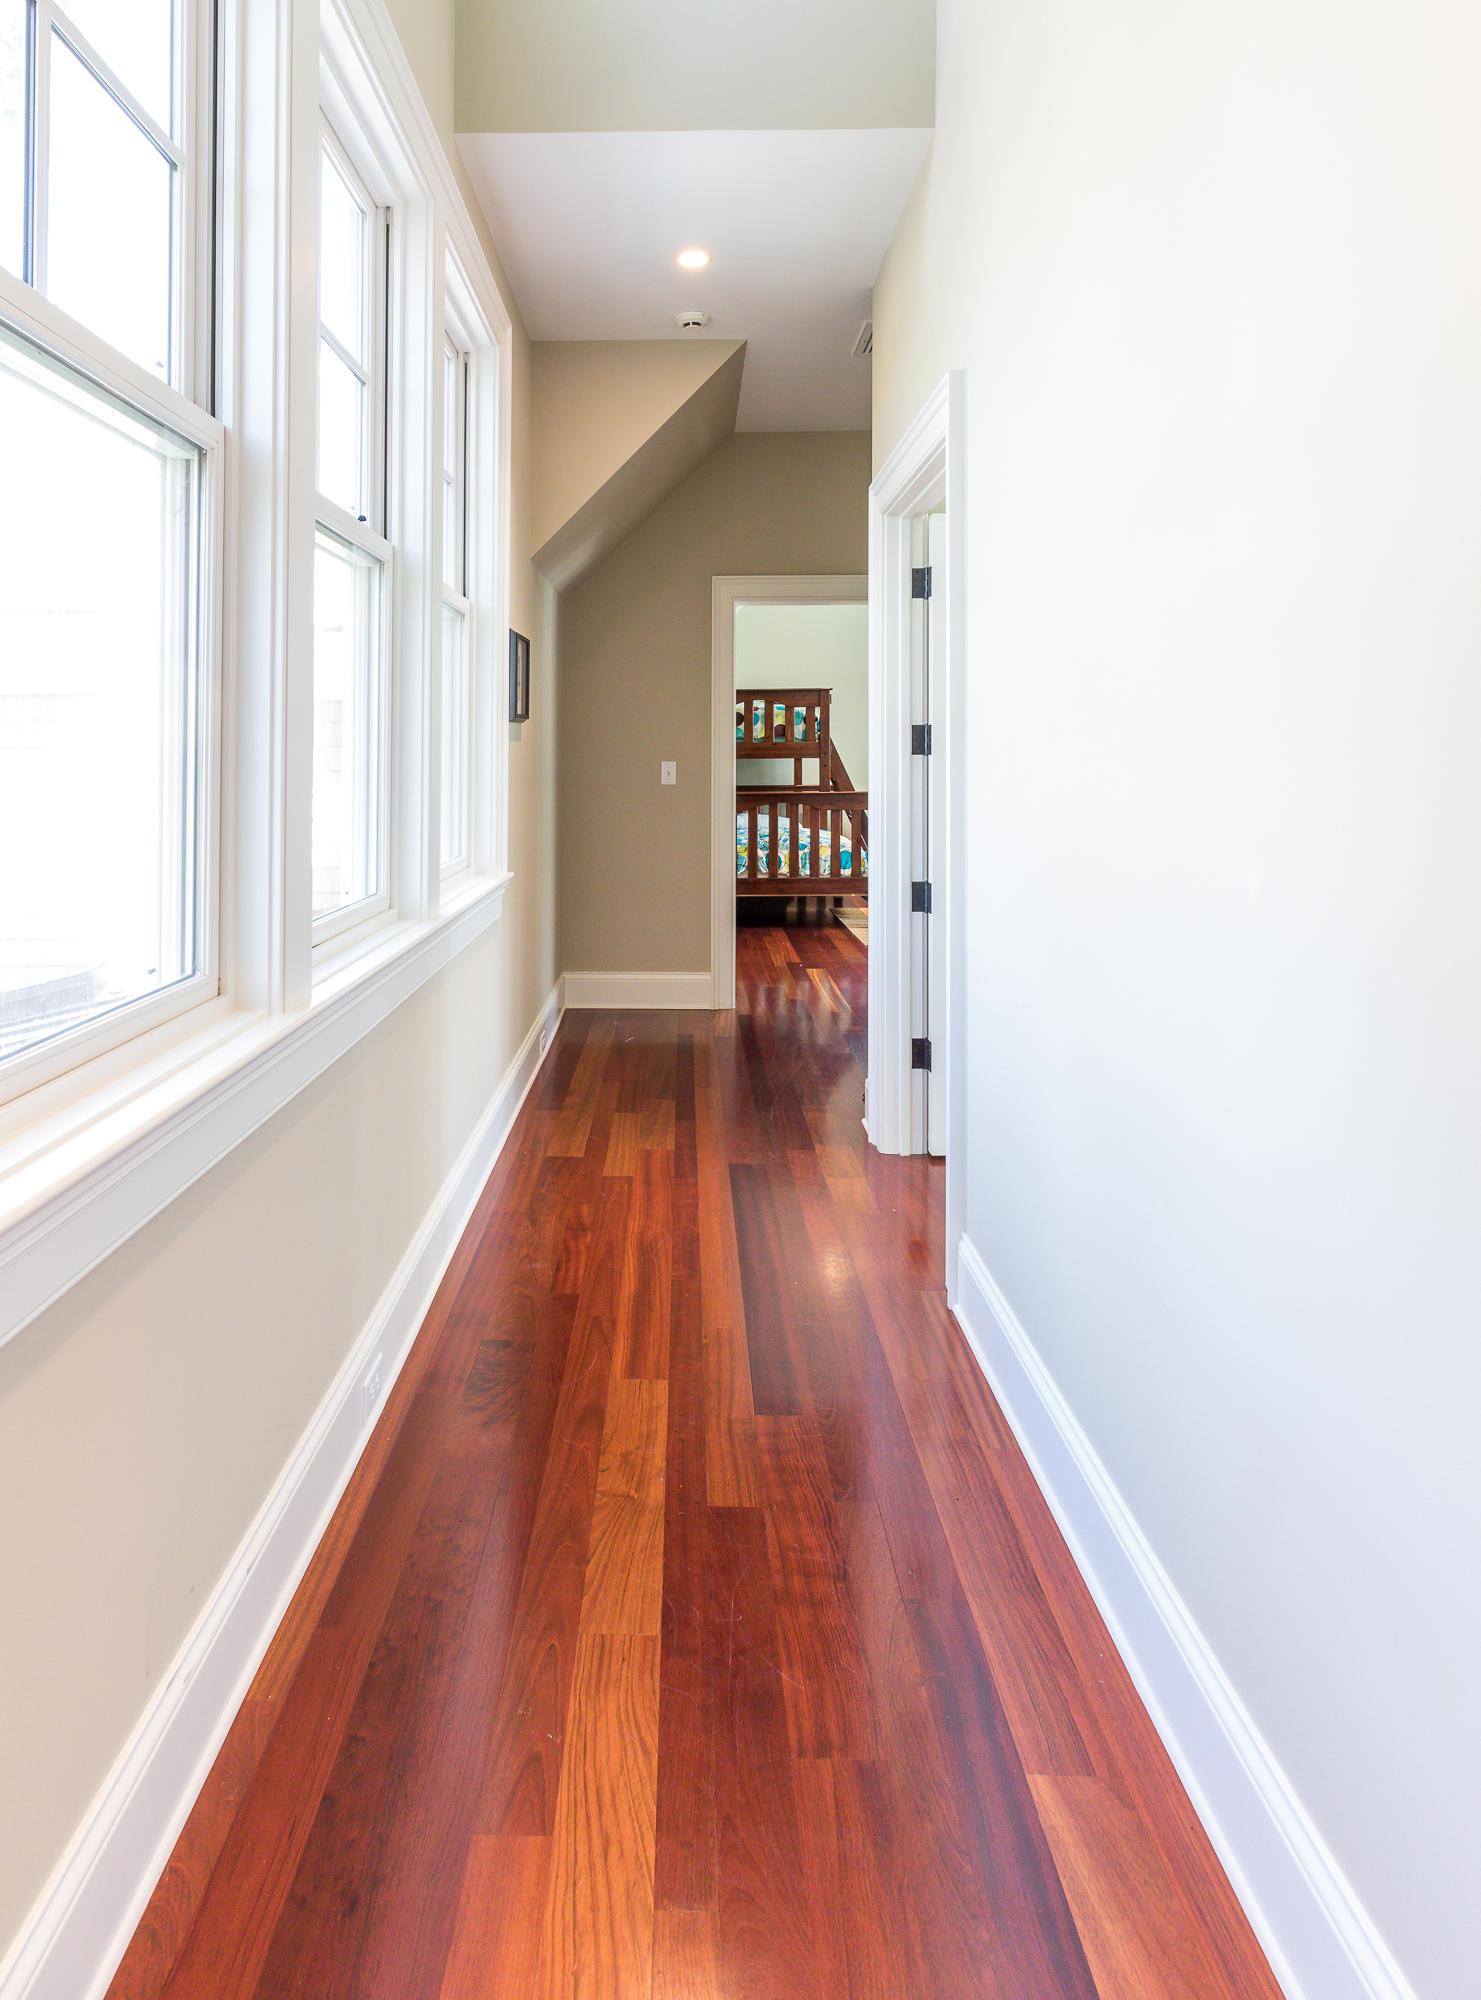 Egret/Pintail Homes For Sale - 117 Bufflehead, Kiawah Island, SC - 26